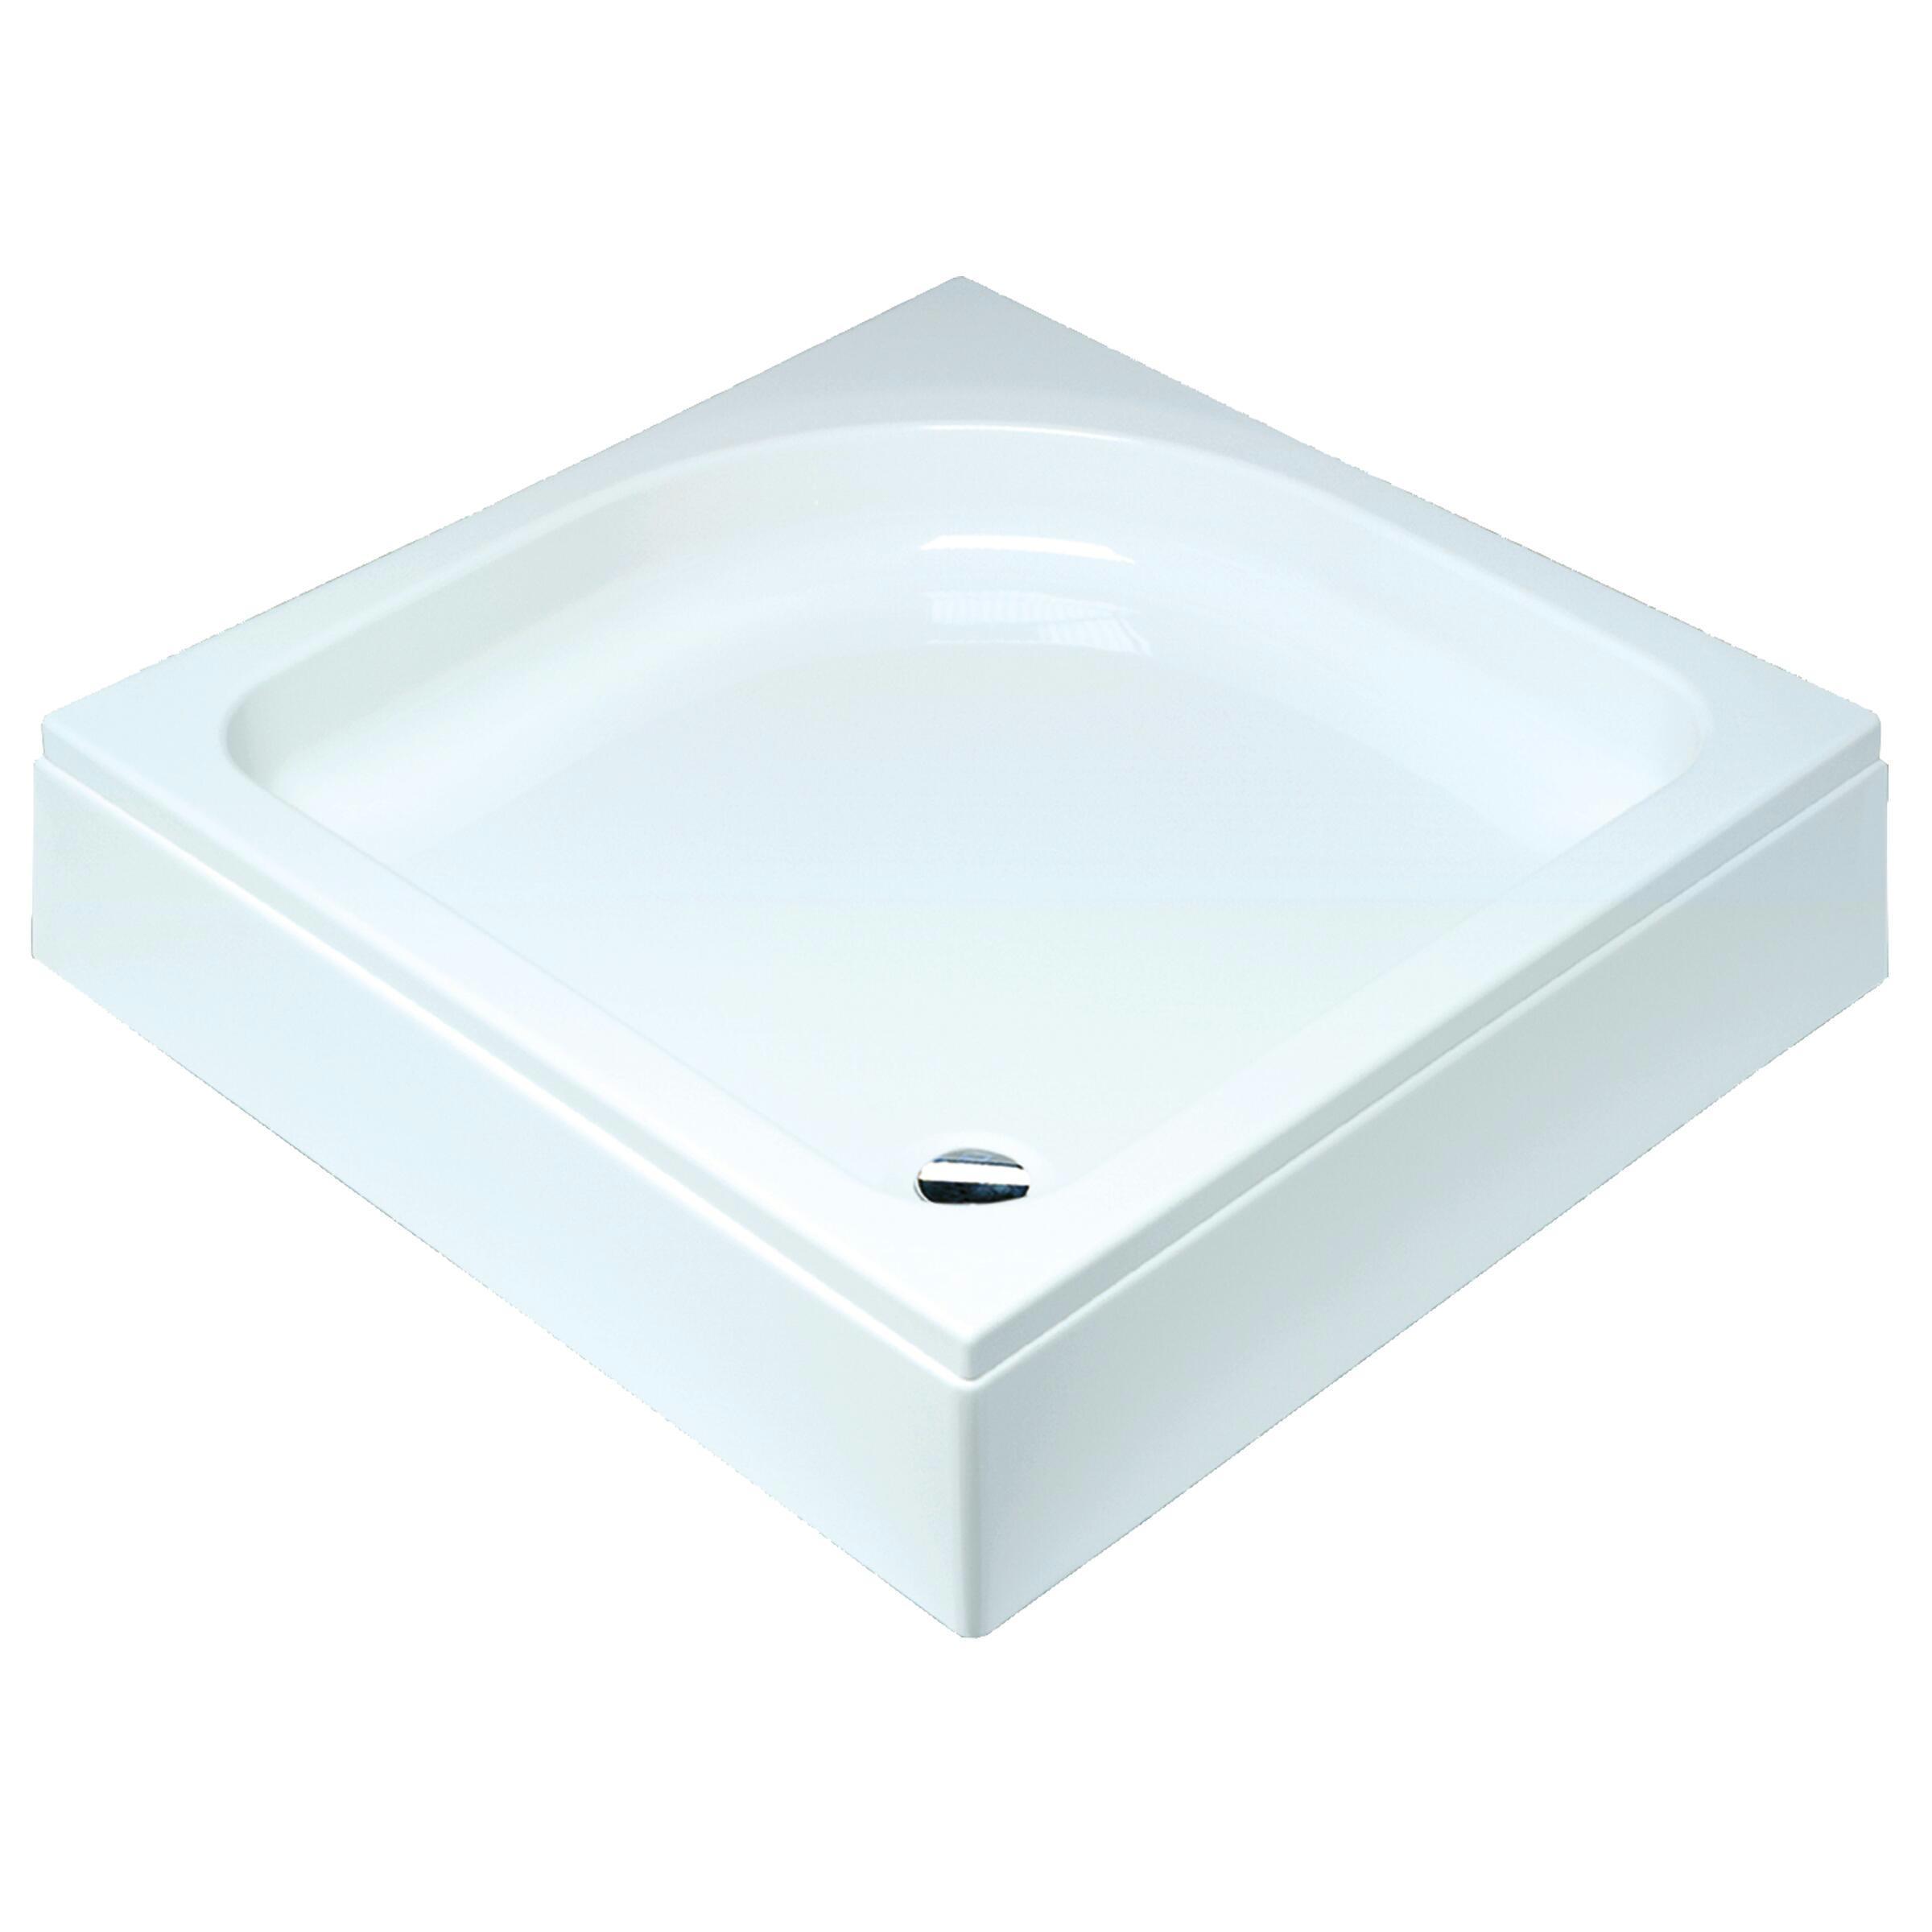 Sealskin Comfort douchebak vierkant 80x80 cm opbouw wit